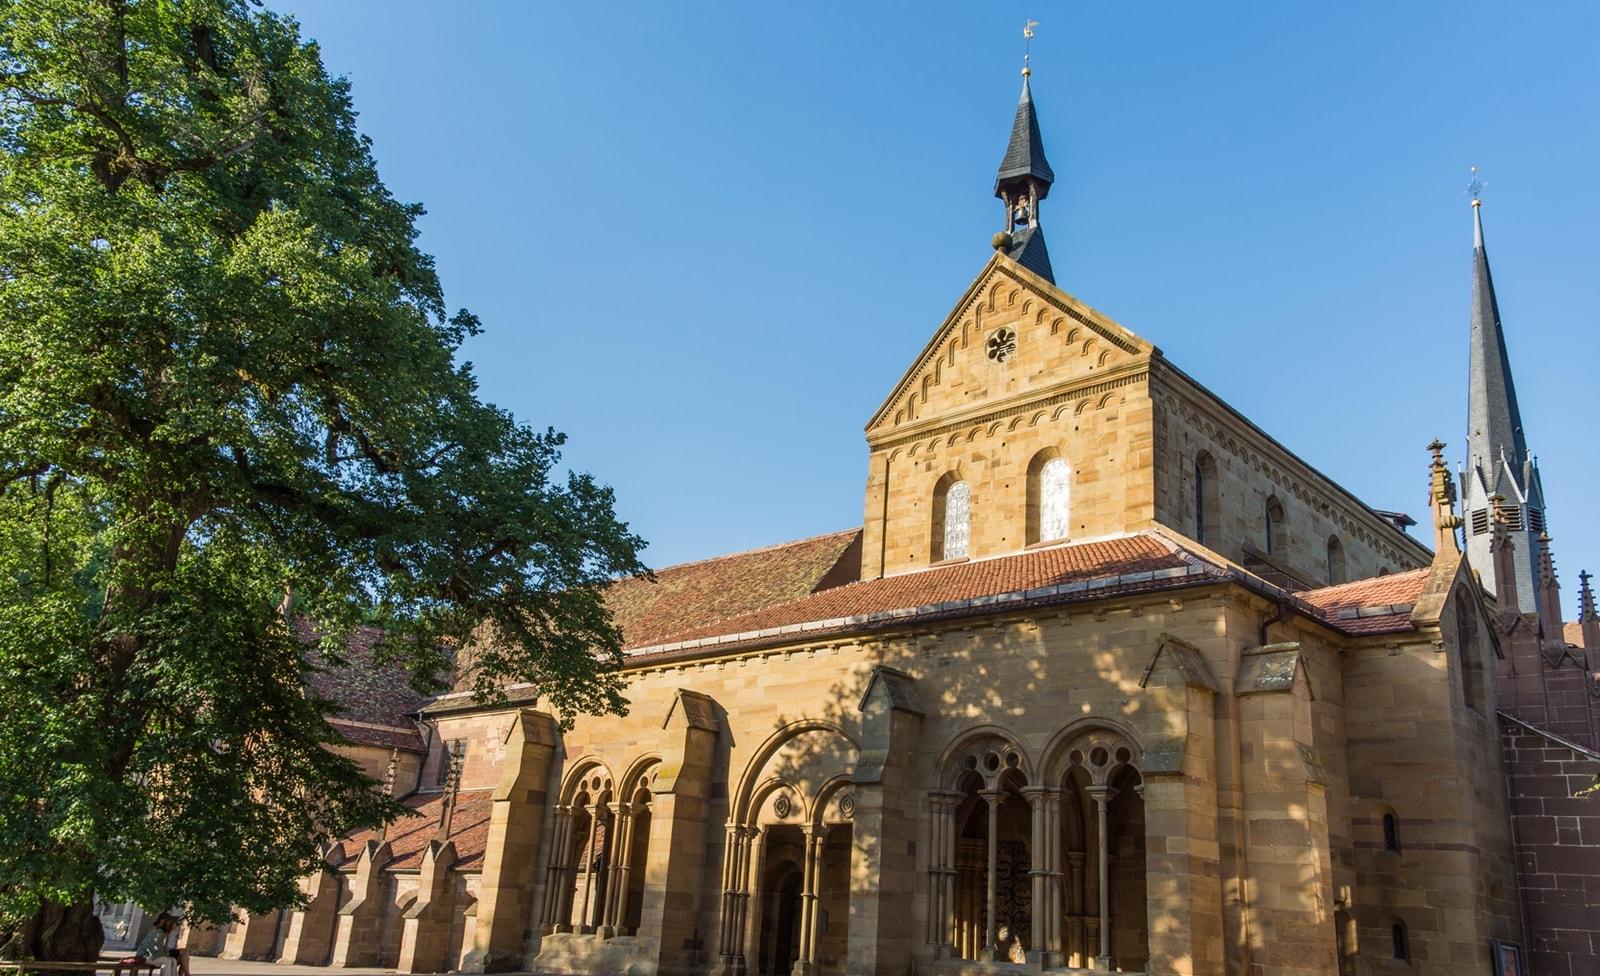 Ehemaliges Kloster in Baden-Württemberg